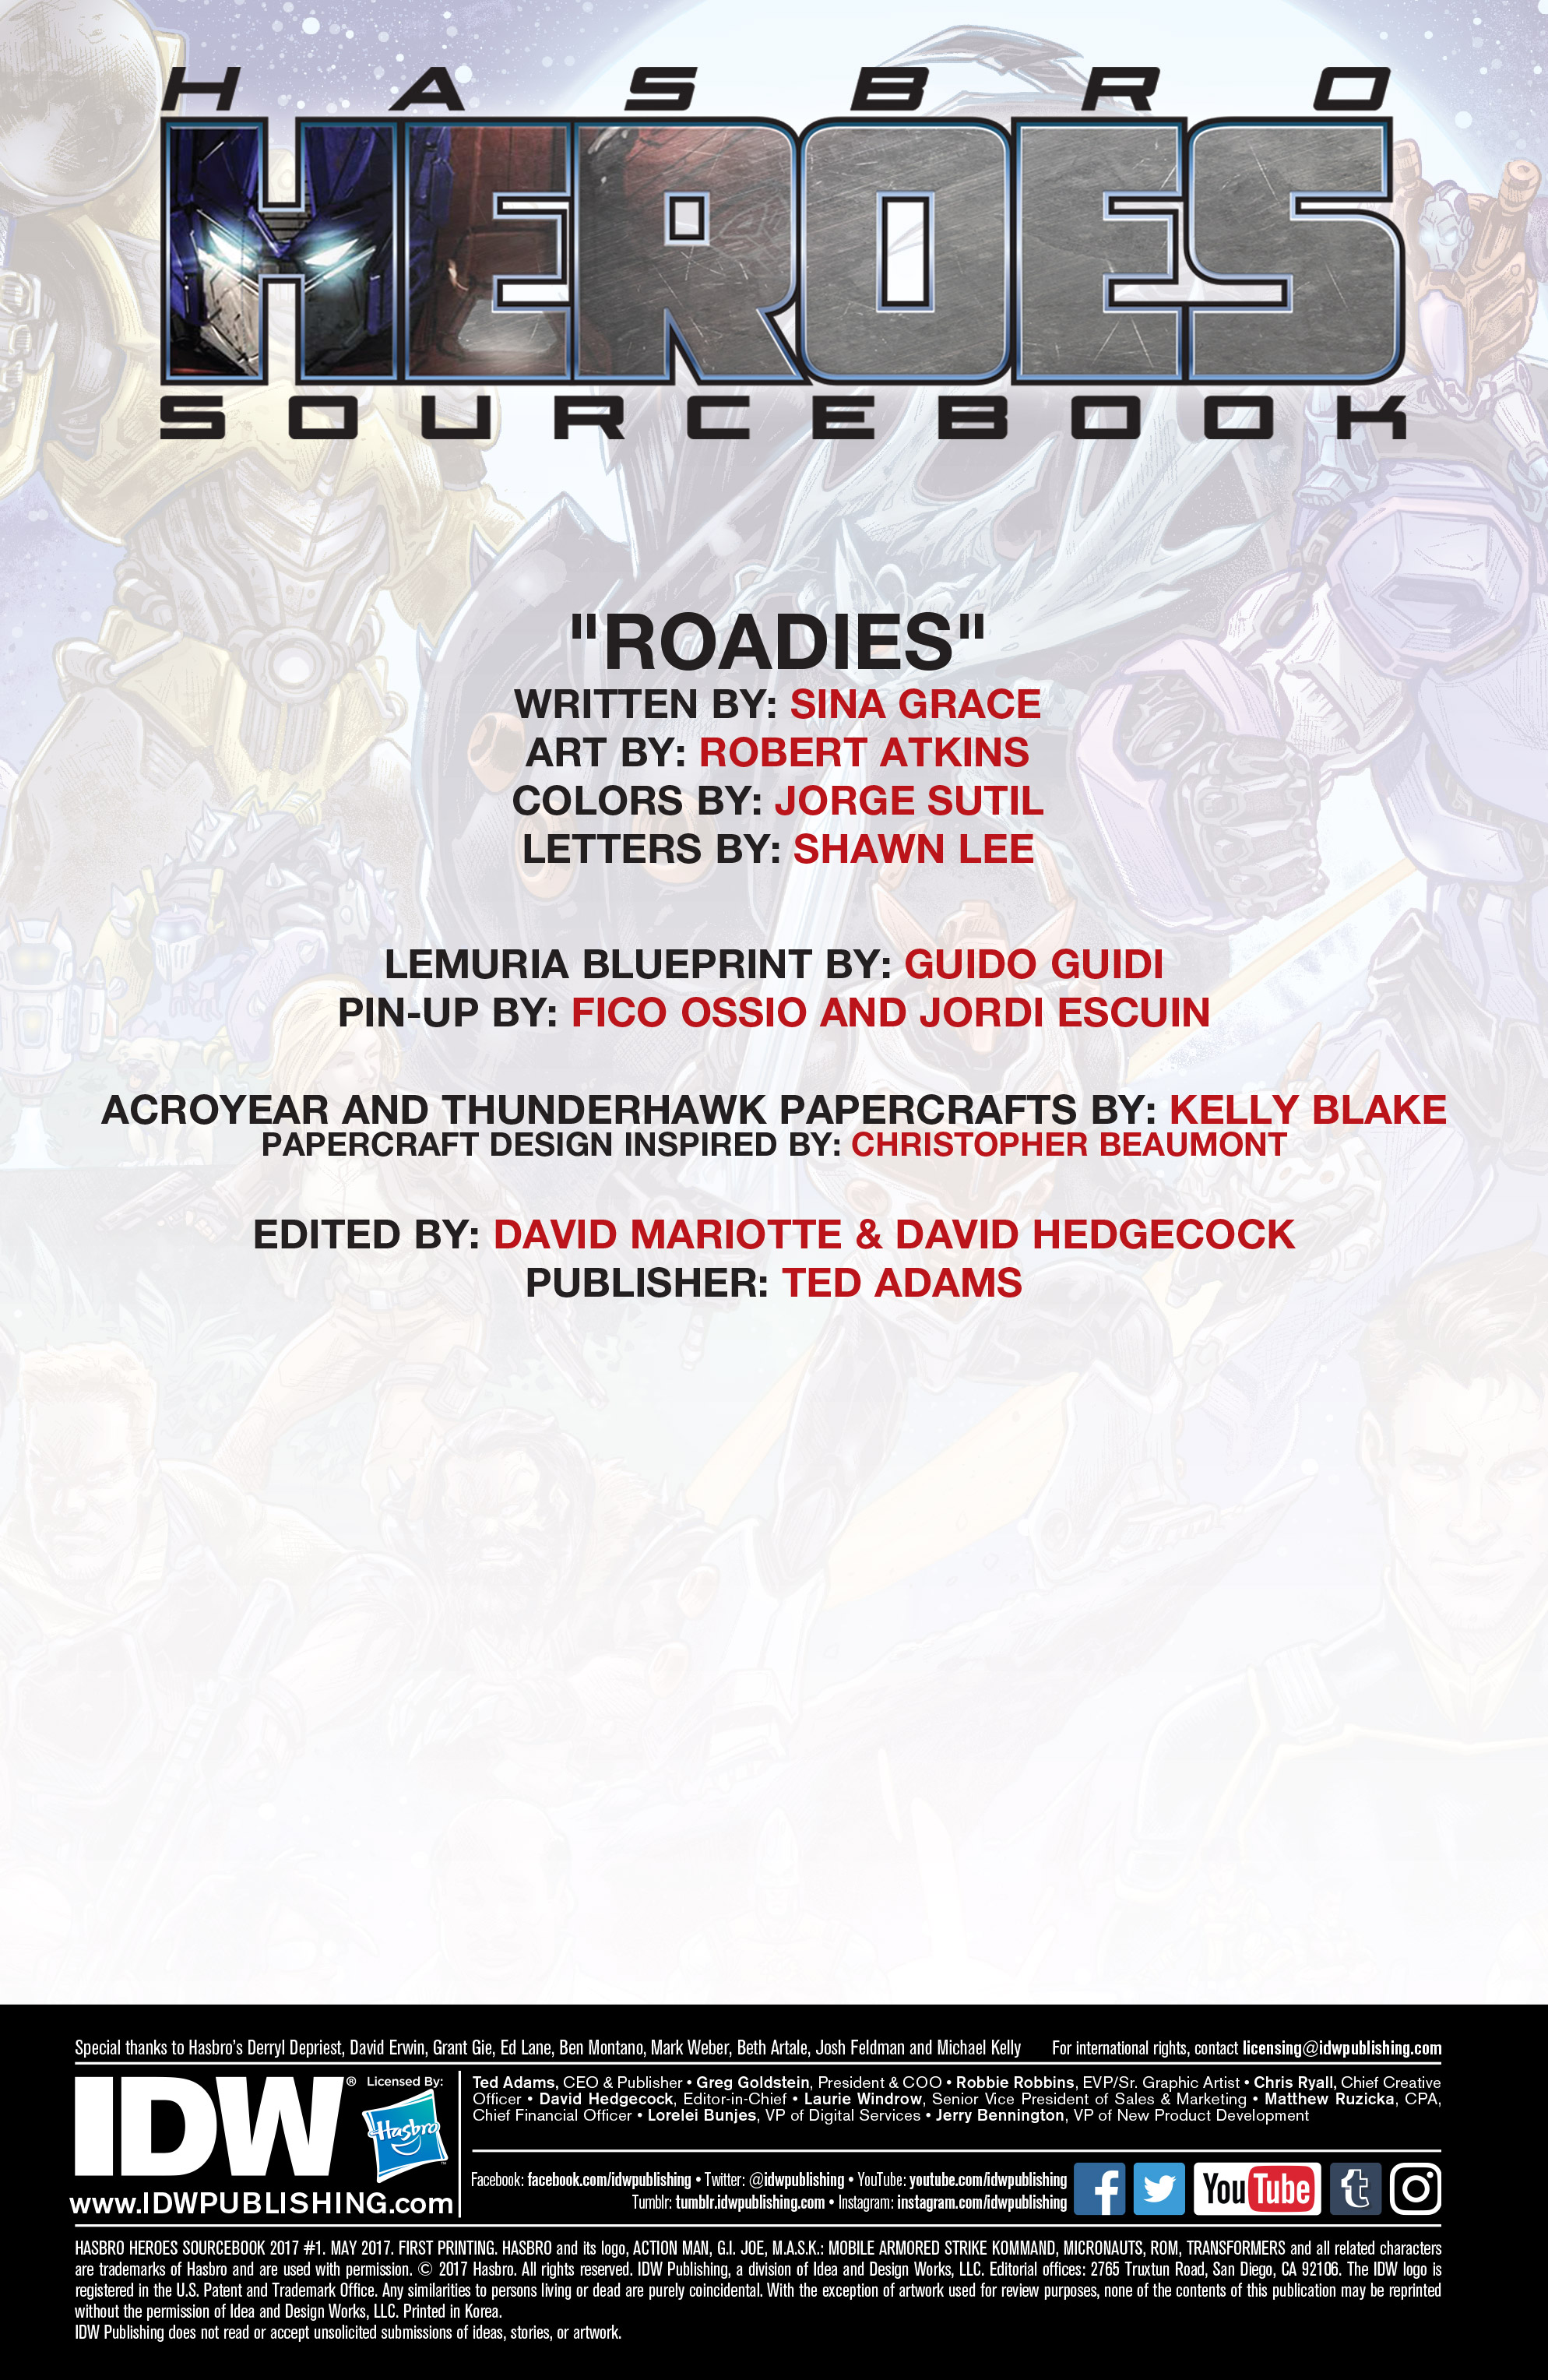 Read online Hasbro Heroes Sourcebook comic -  Issue #1 - 2